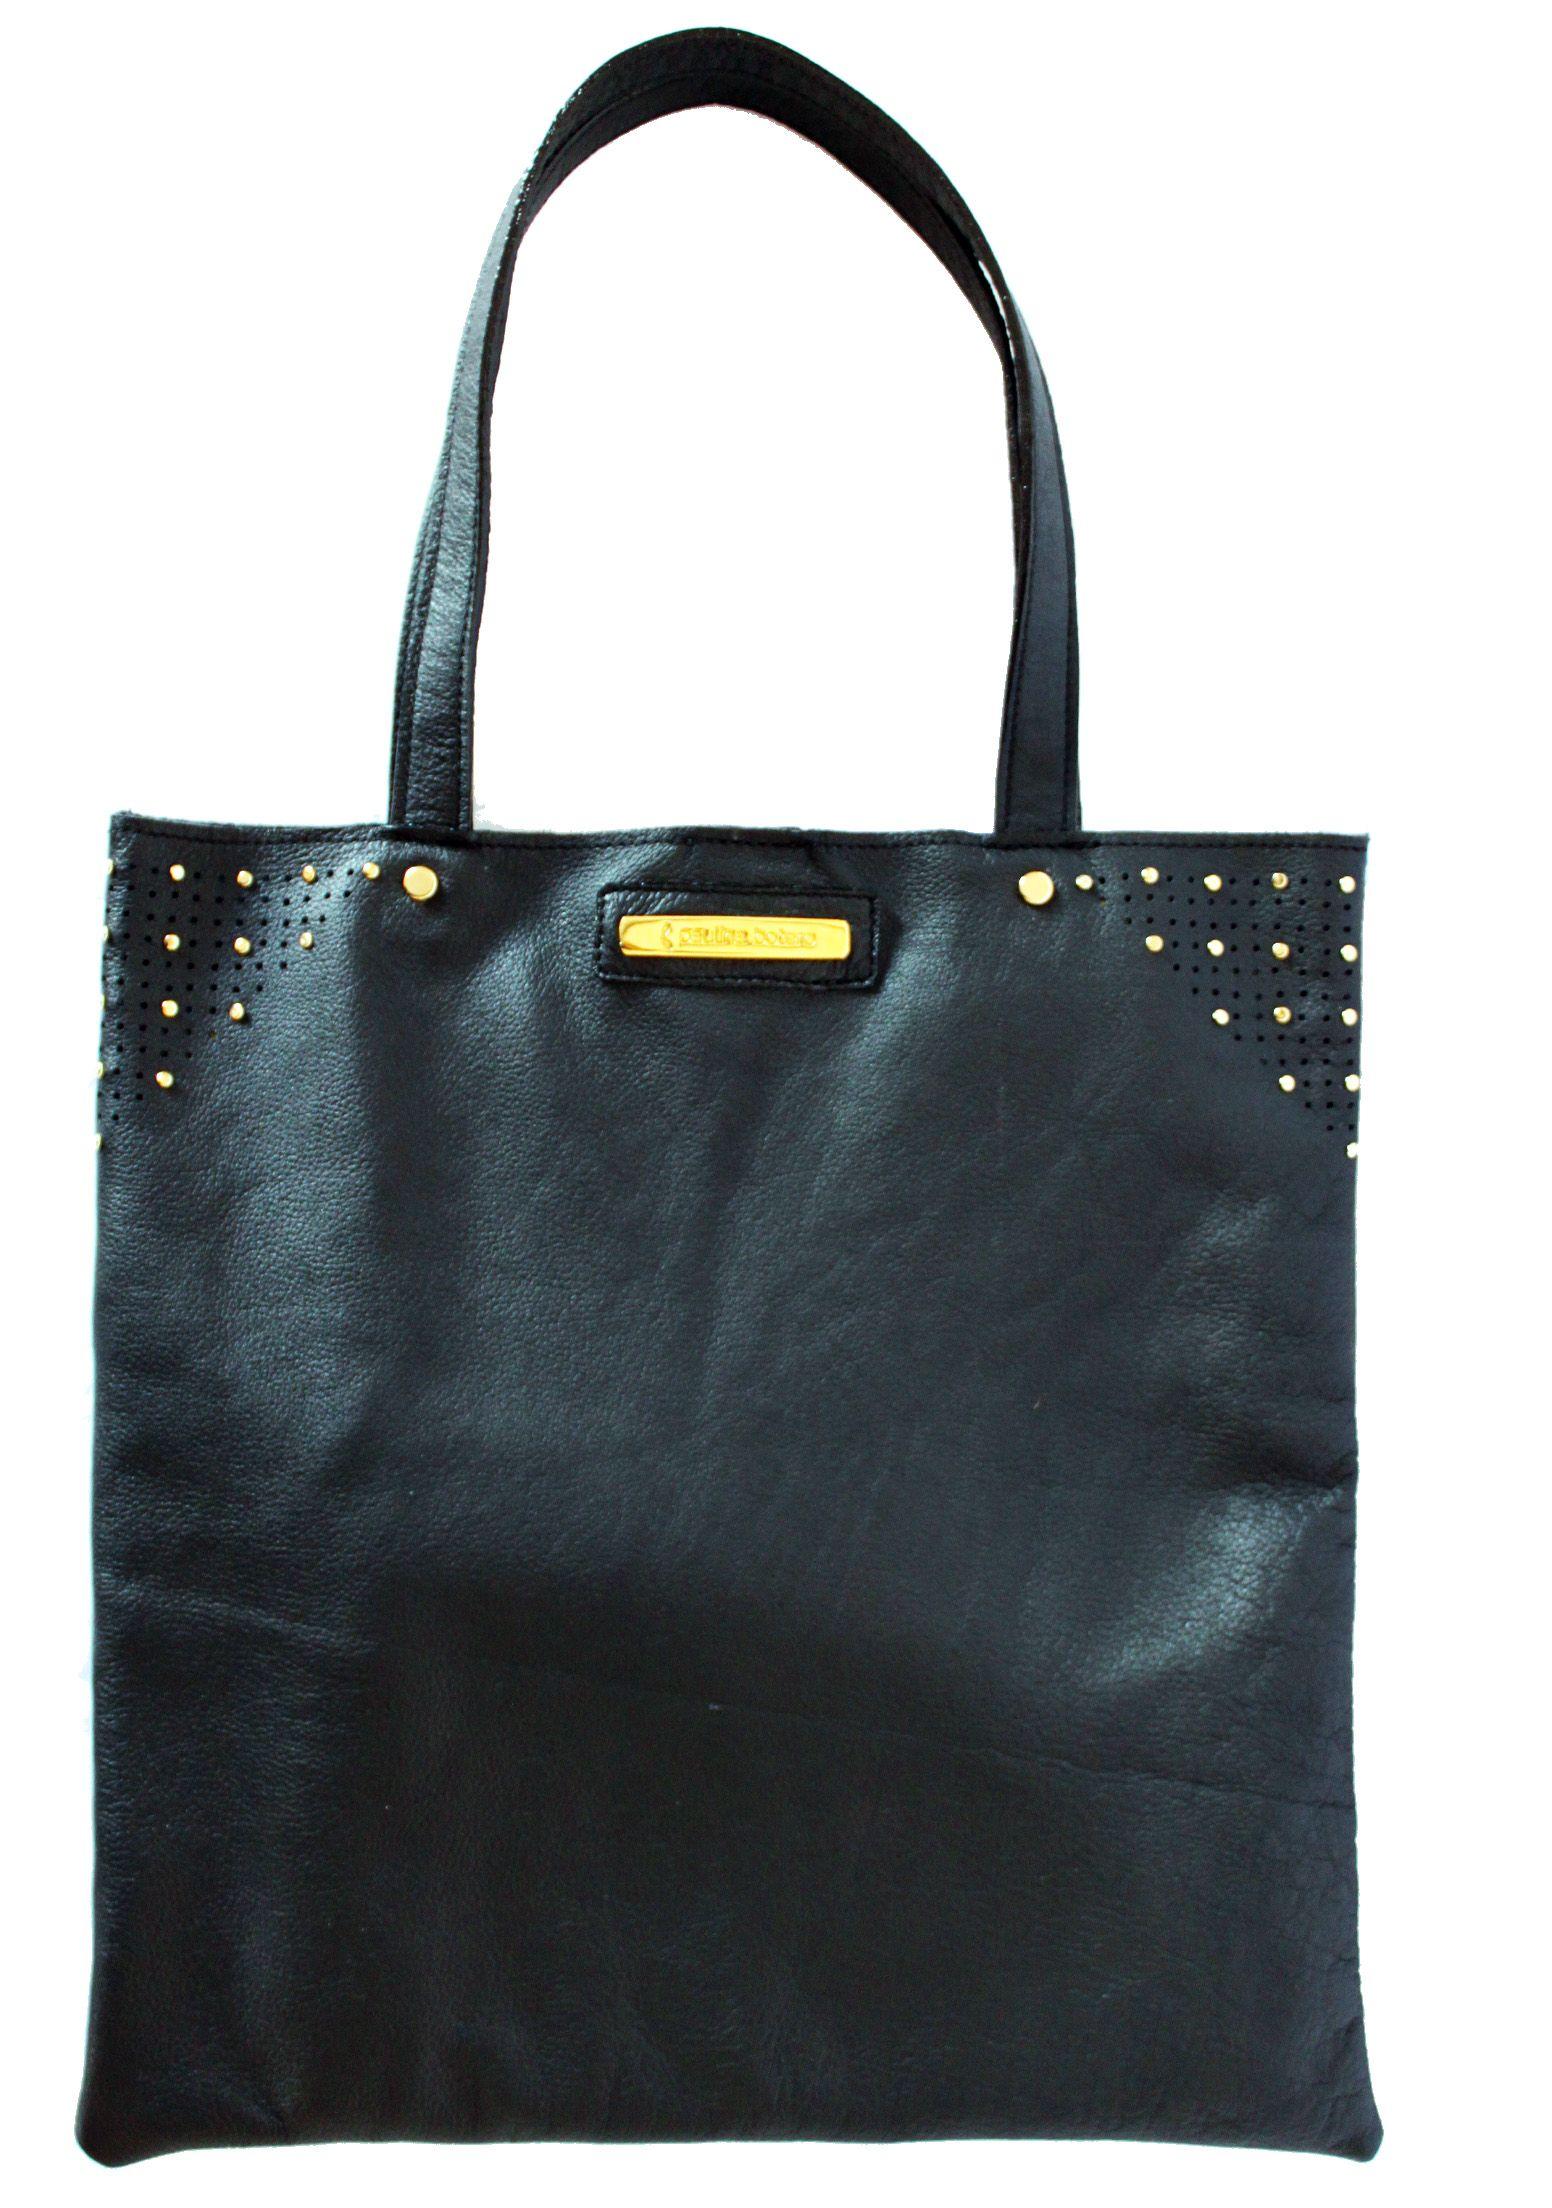 Black flat bag. By Paulina Botero